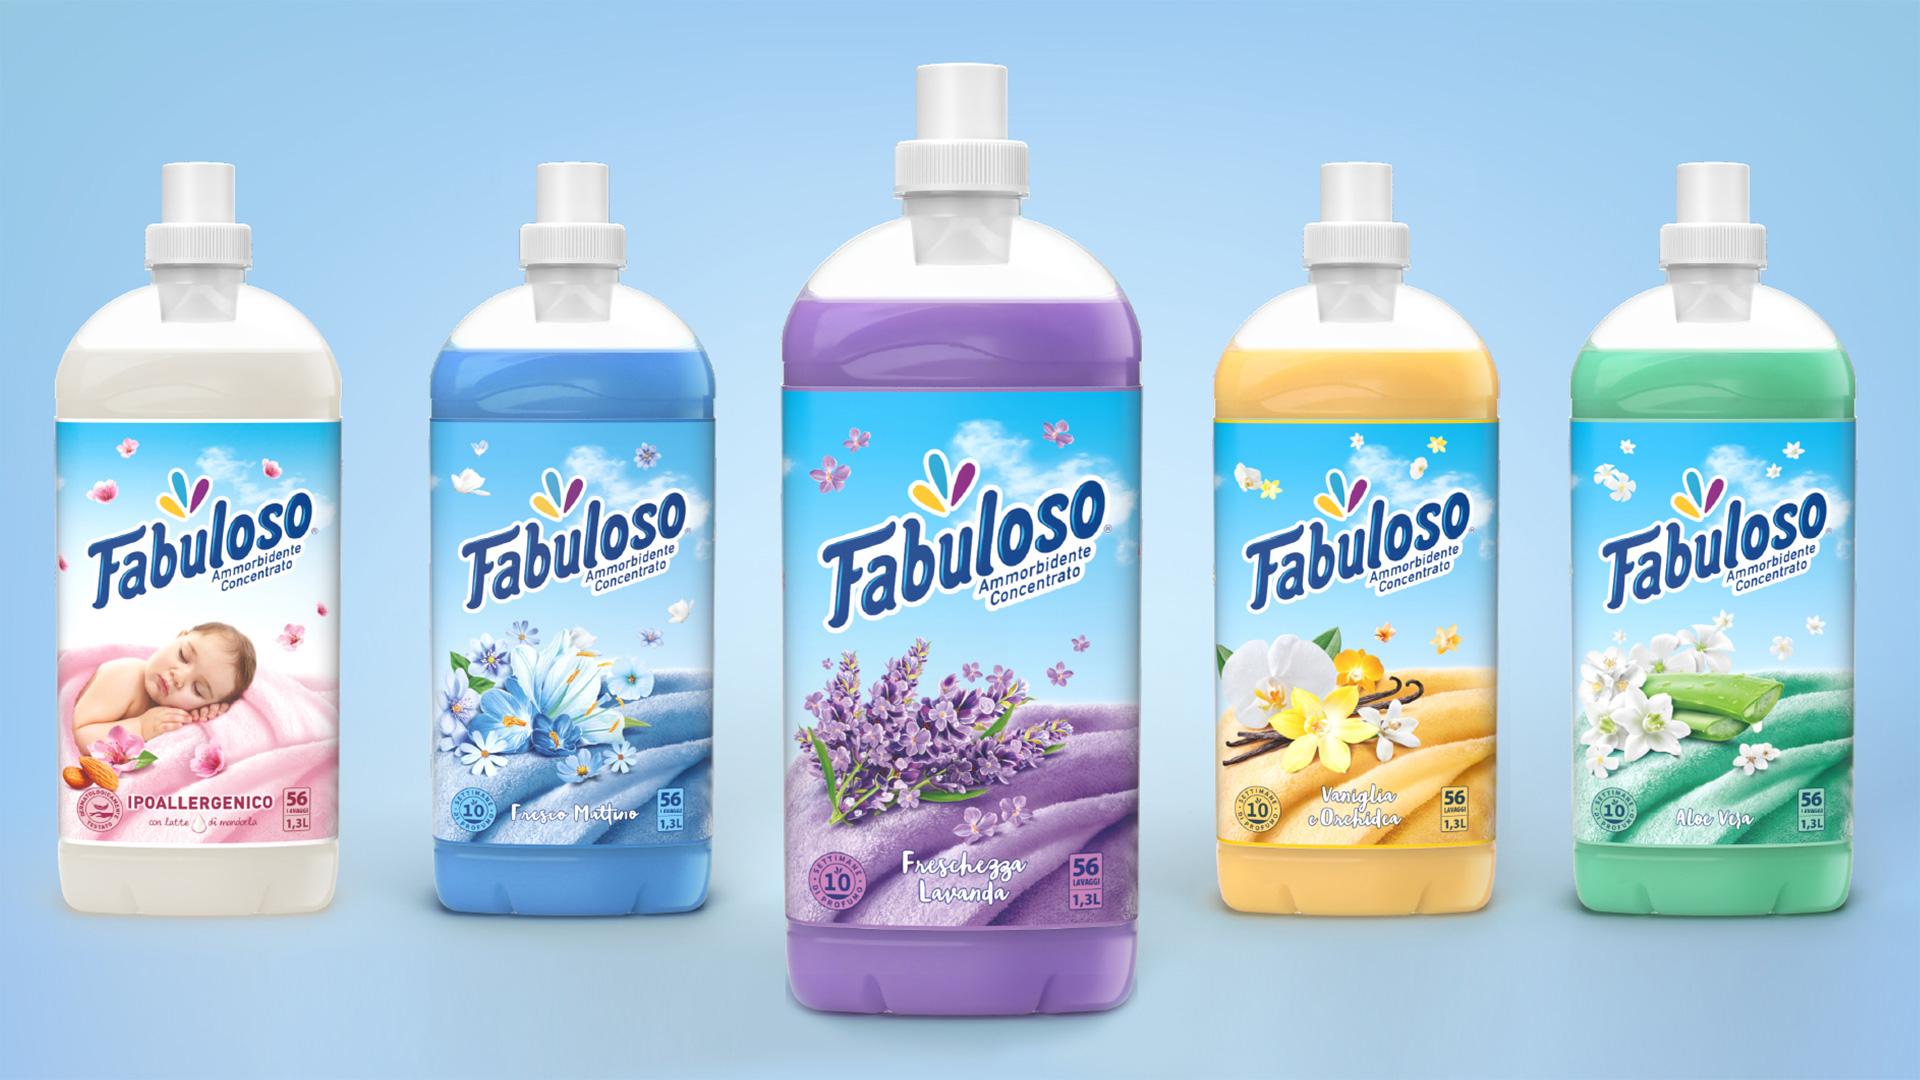 Fabuloso-Rba-Design-002